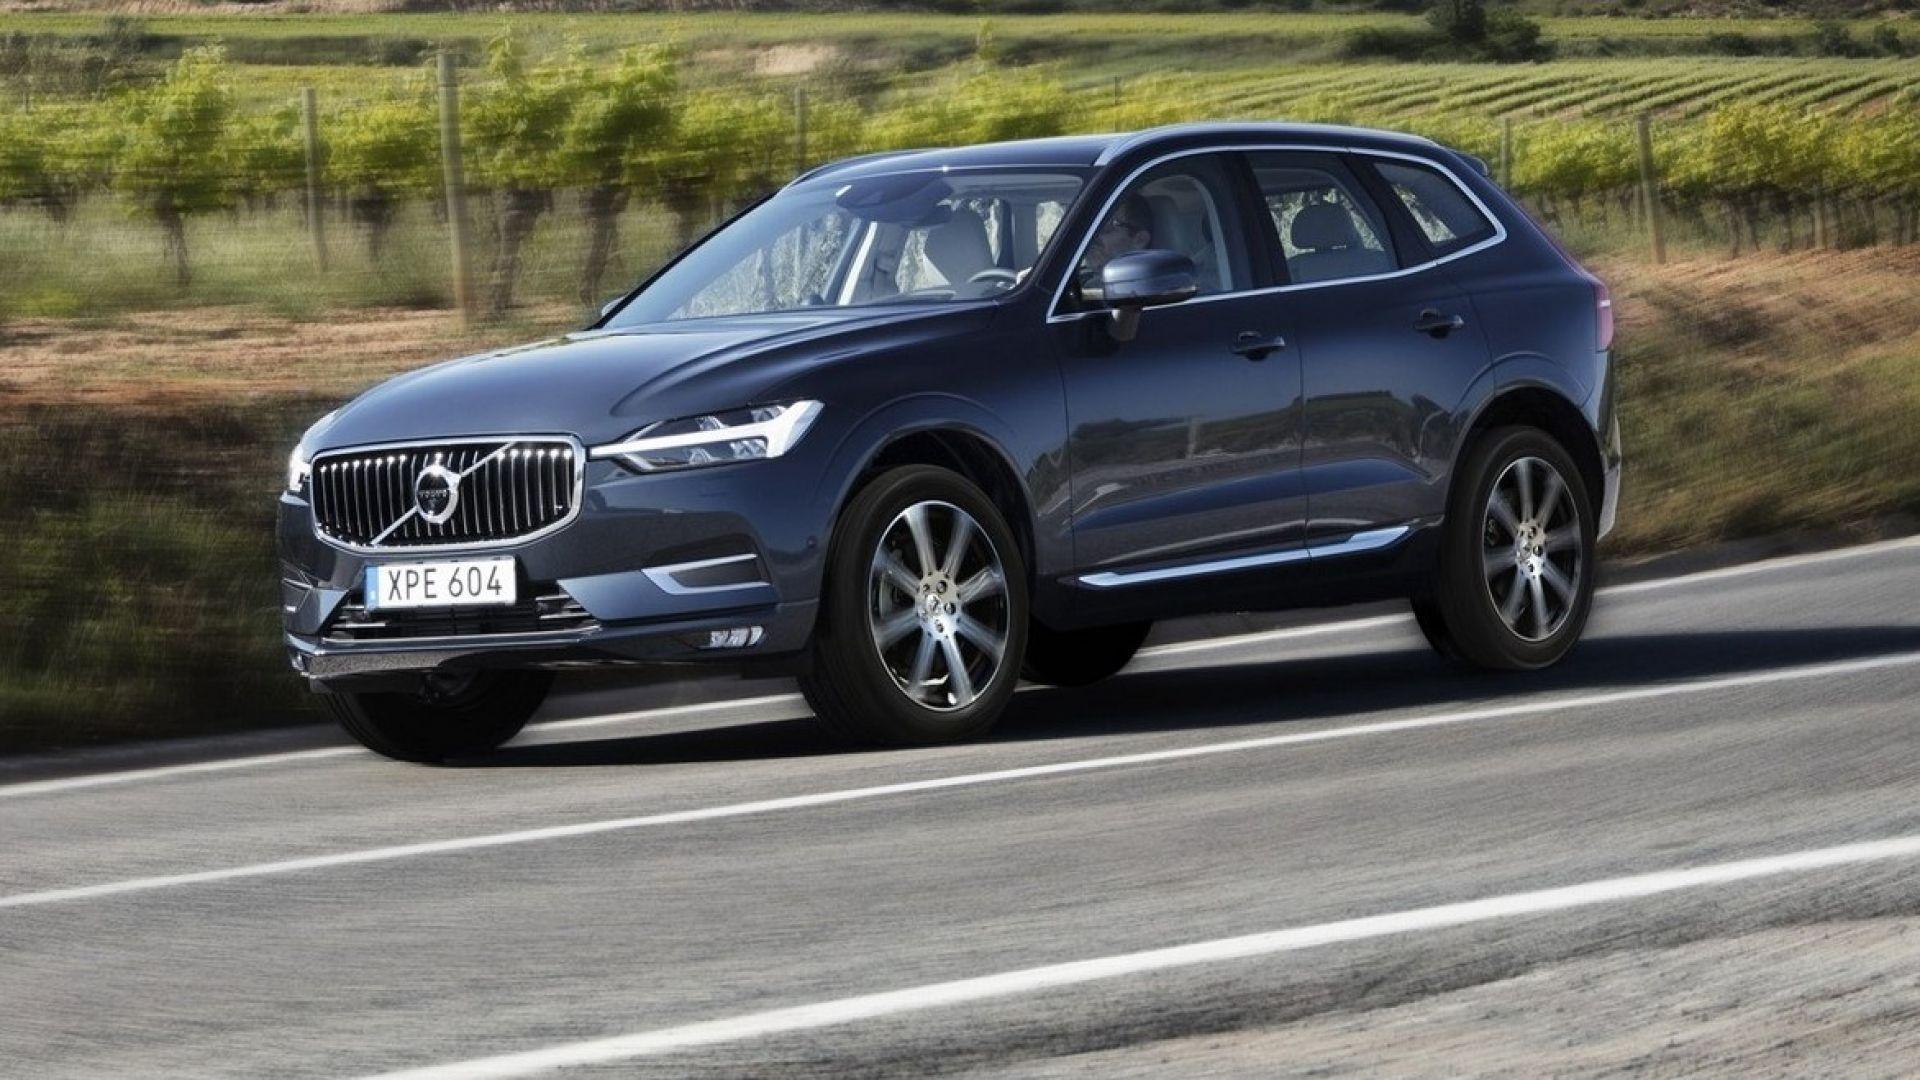 Prova video: Nuova Volvo XC60: prova, video, prezzi - MotorBox